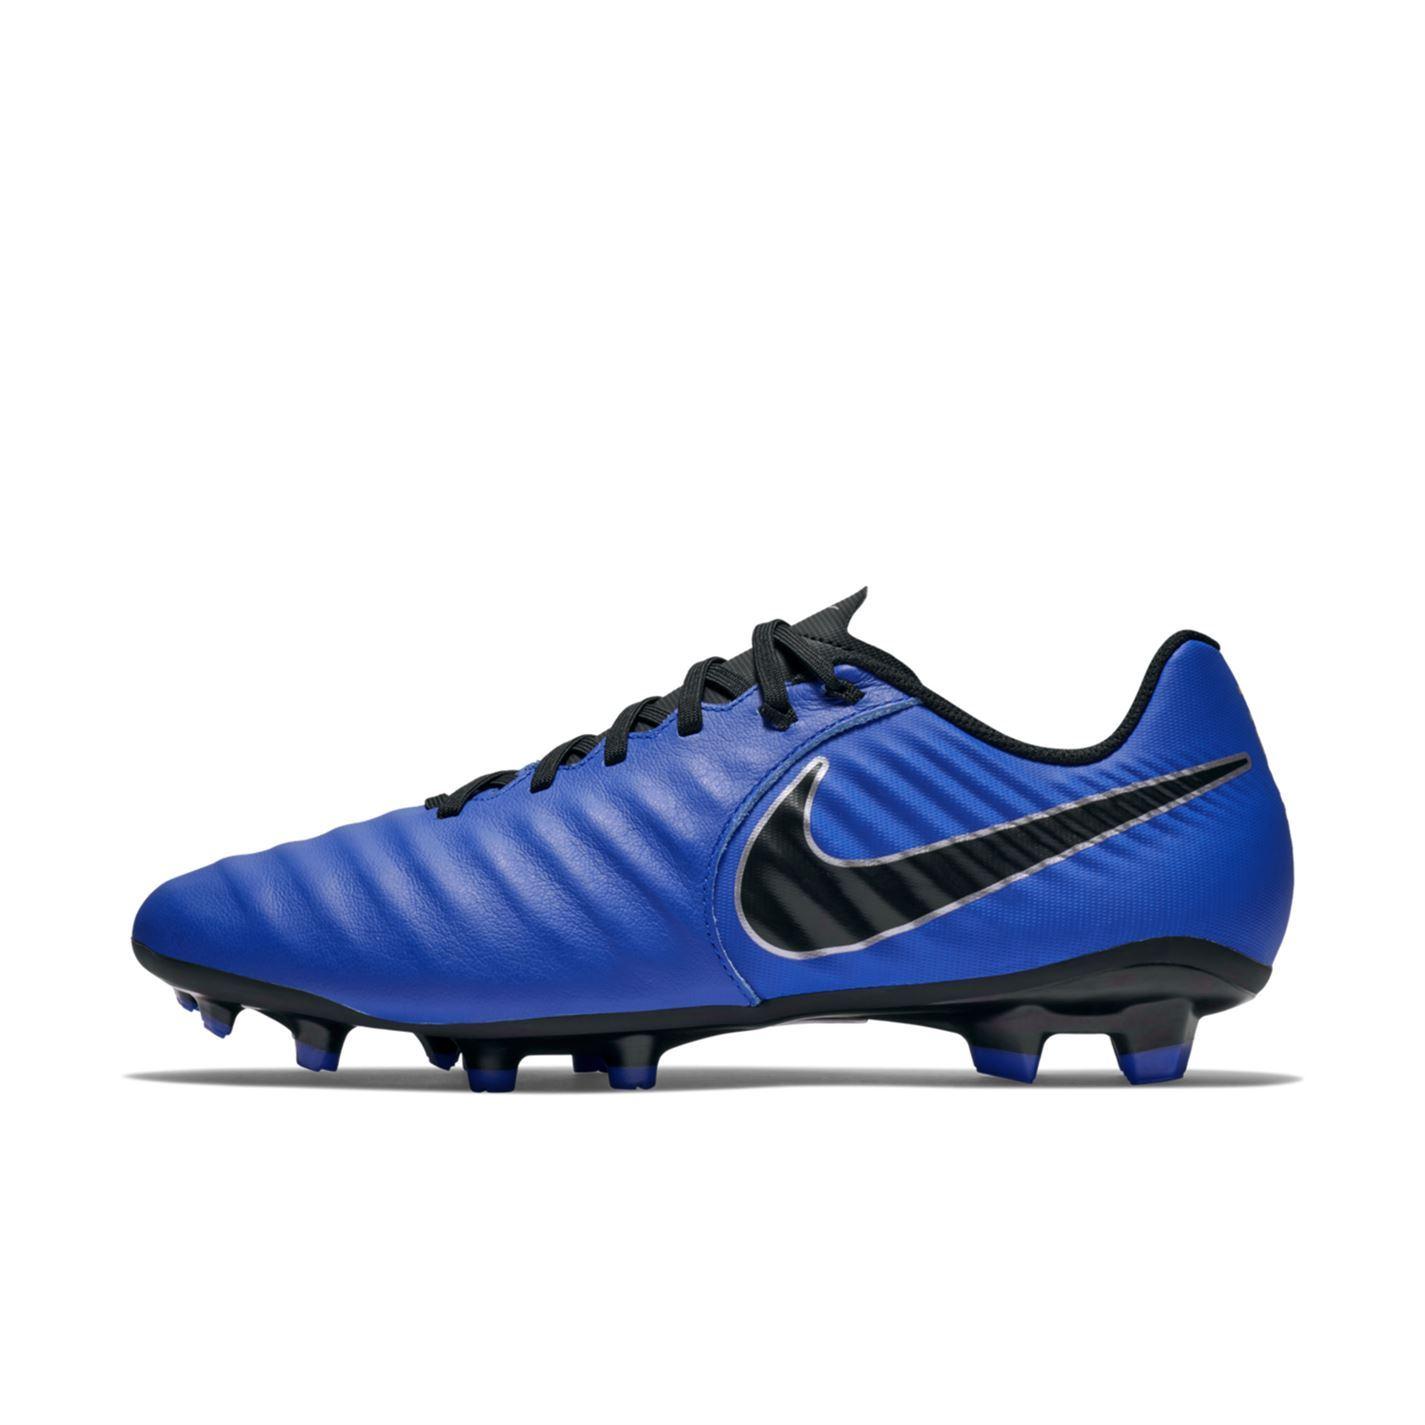 free shipping ef26e 13b25 Nike-Tiempo-Legend-Academy-FG-Firm-Ground-Football-